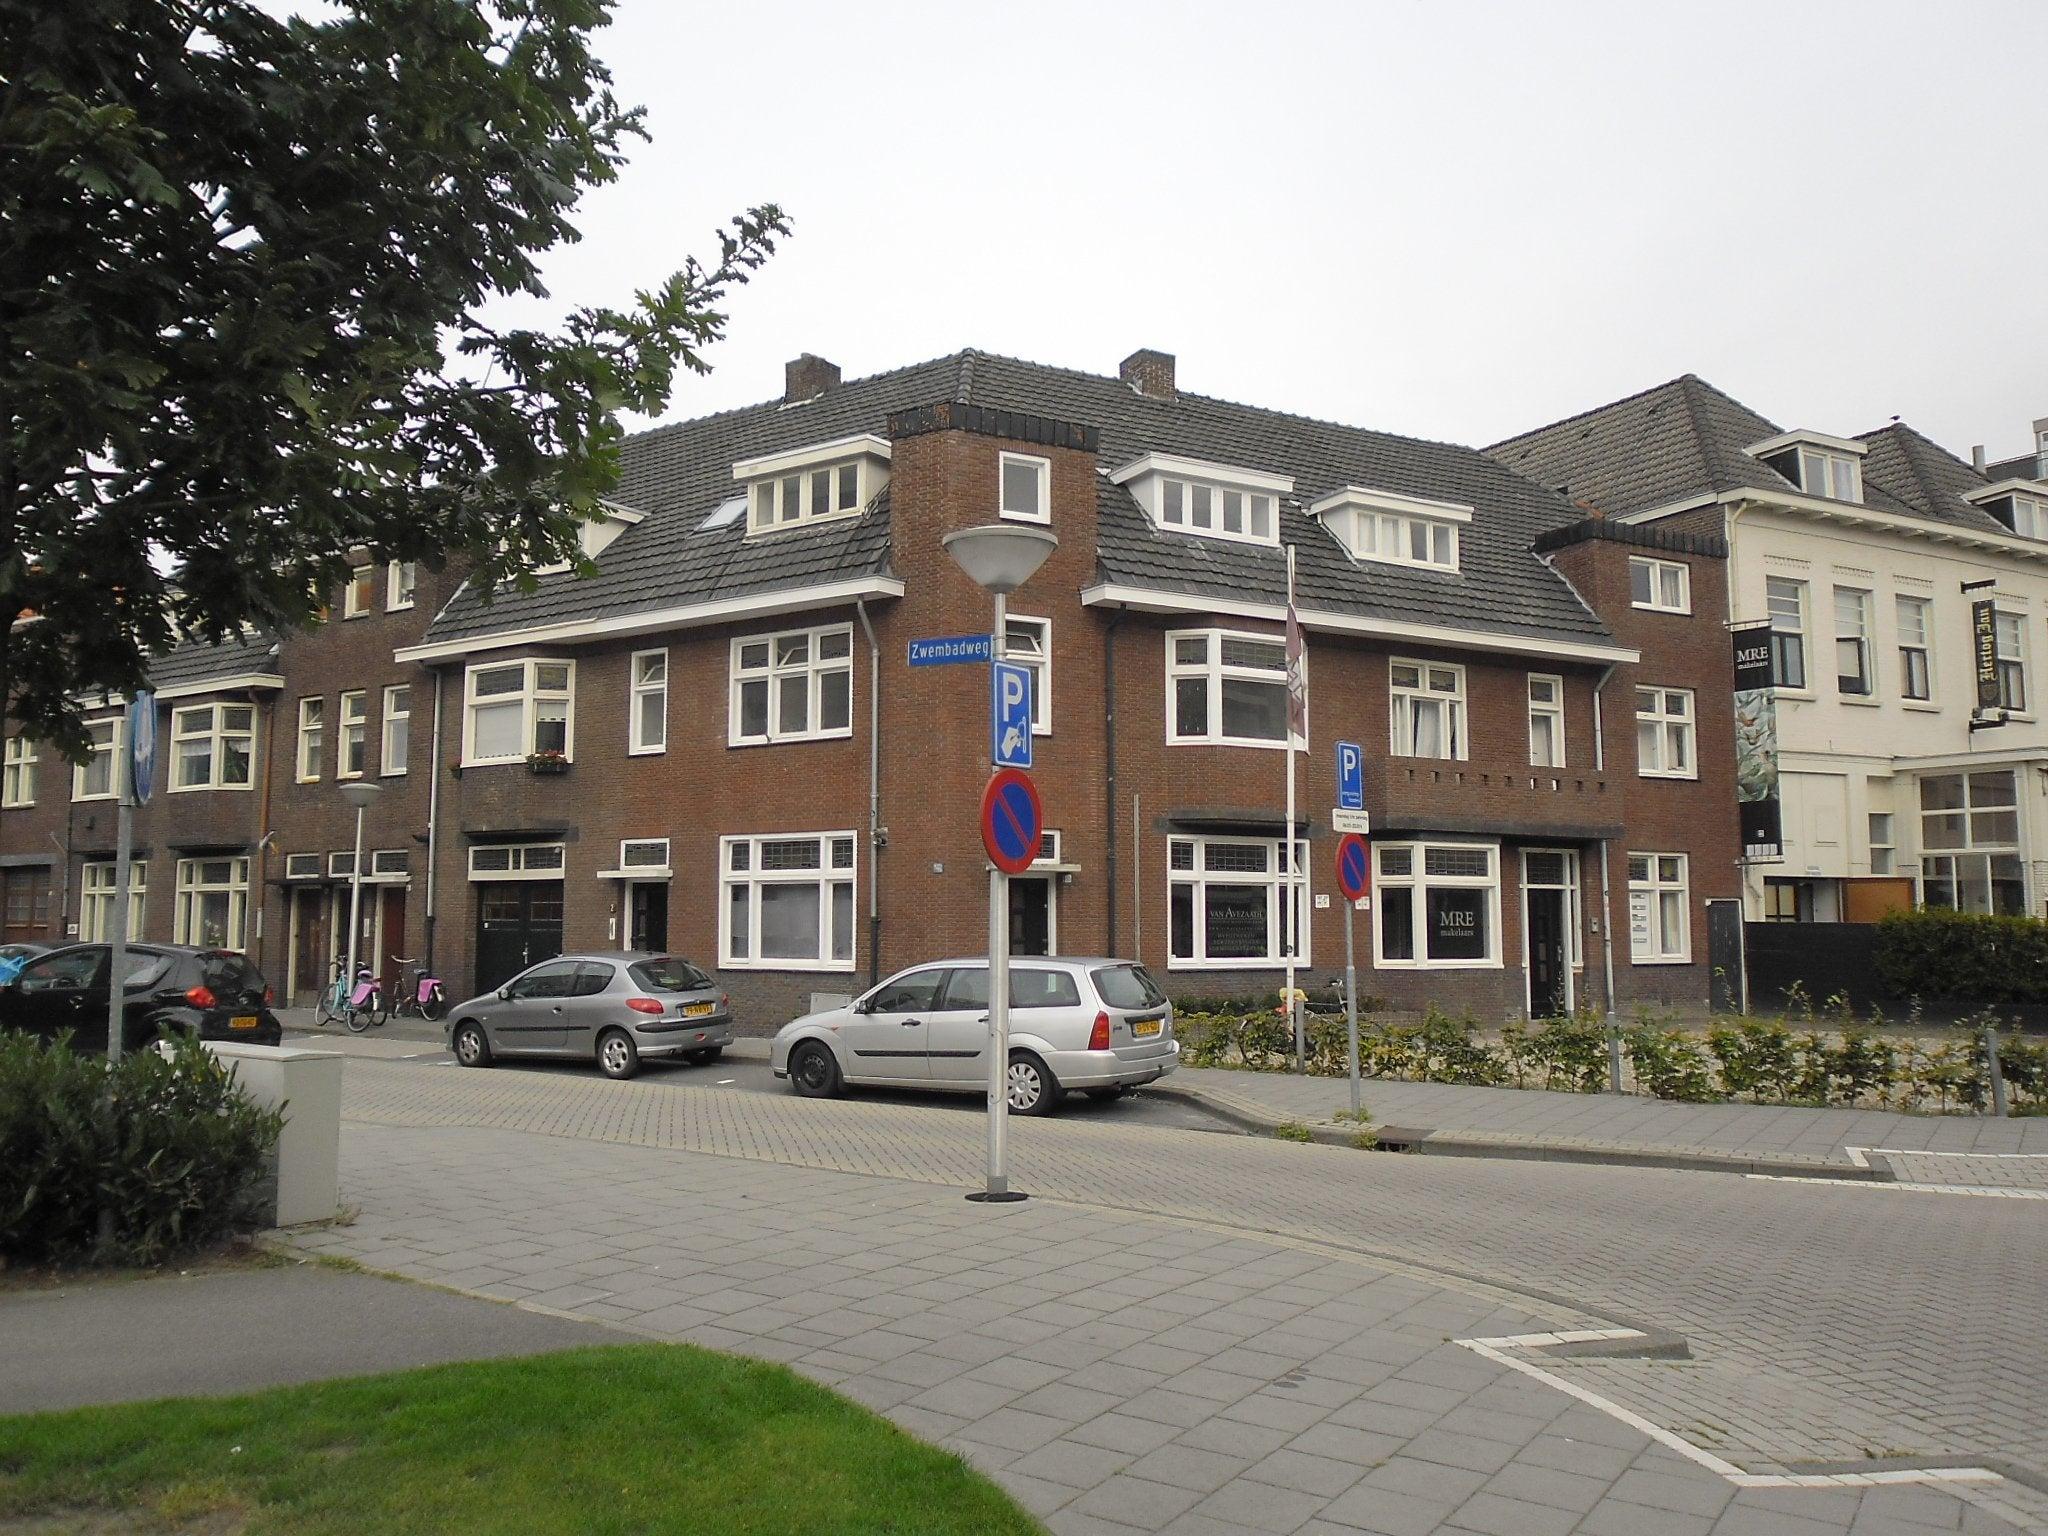 https://public.parariusoffice.nl/298/photos/huge/51410260.1510150628-821.JPG